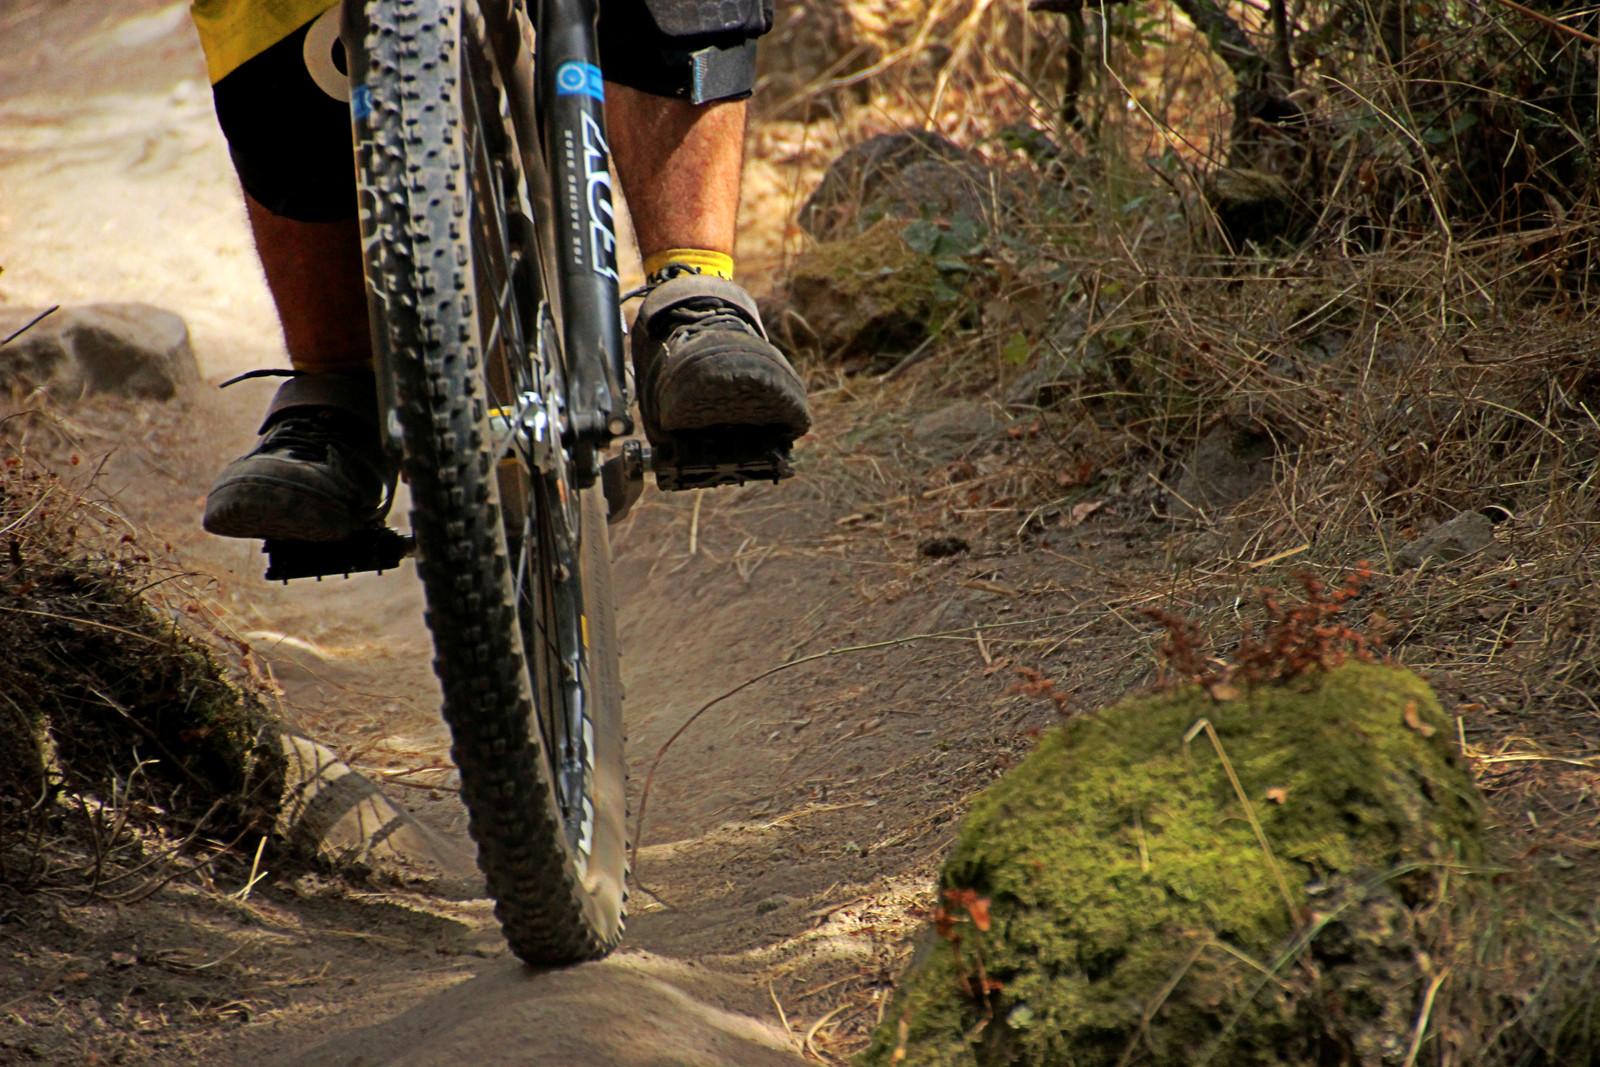 Super Enduro Tolfa 02 - Ruggero - Mountain Biking Pictures - Vital MTB